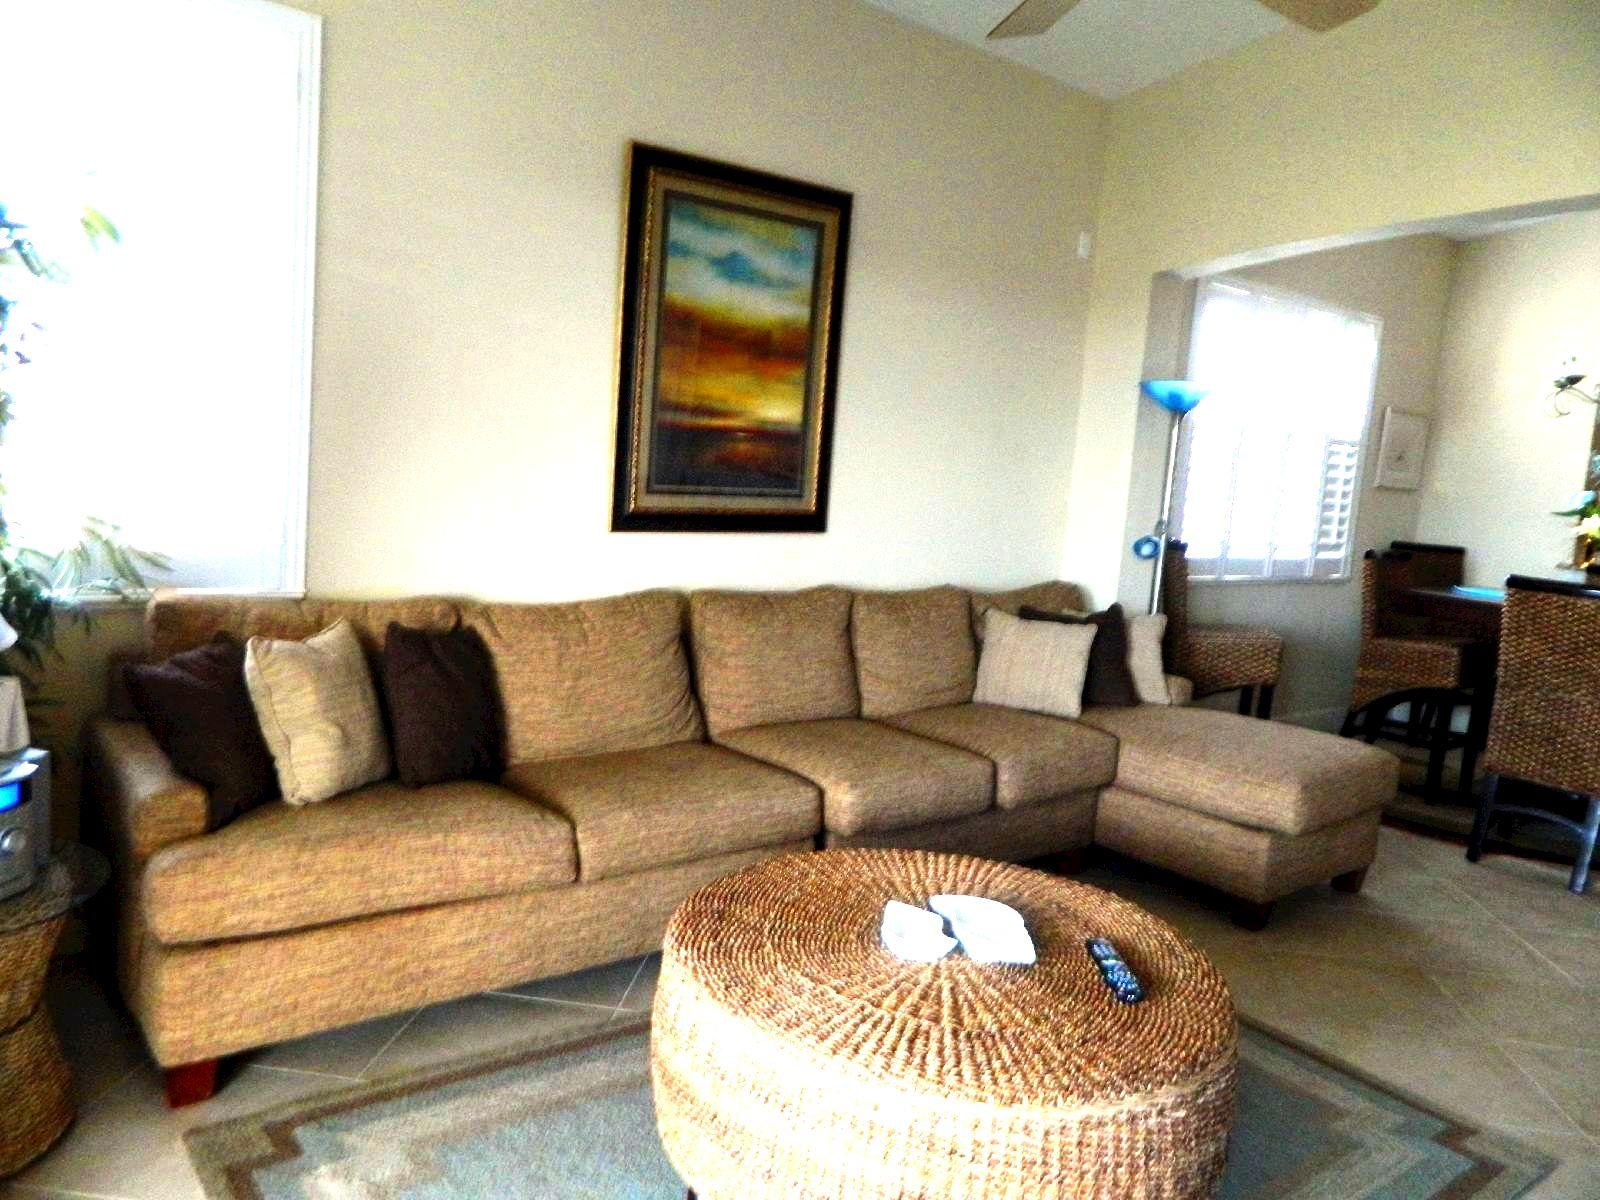 Cinnamon Beach Fl Rental Living Room Here are some  : sofa2232 from www.floridavacationrentaldeals.com size 1600 x 1200 jpeg 276kB